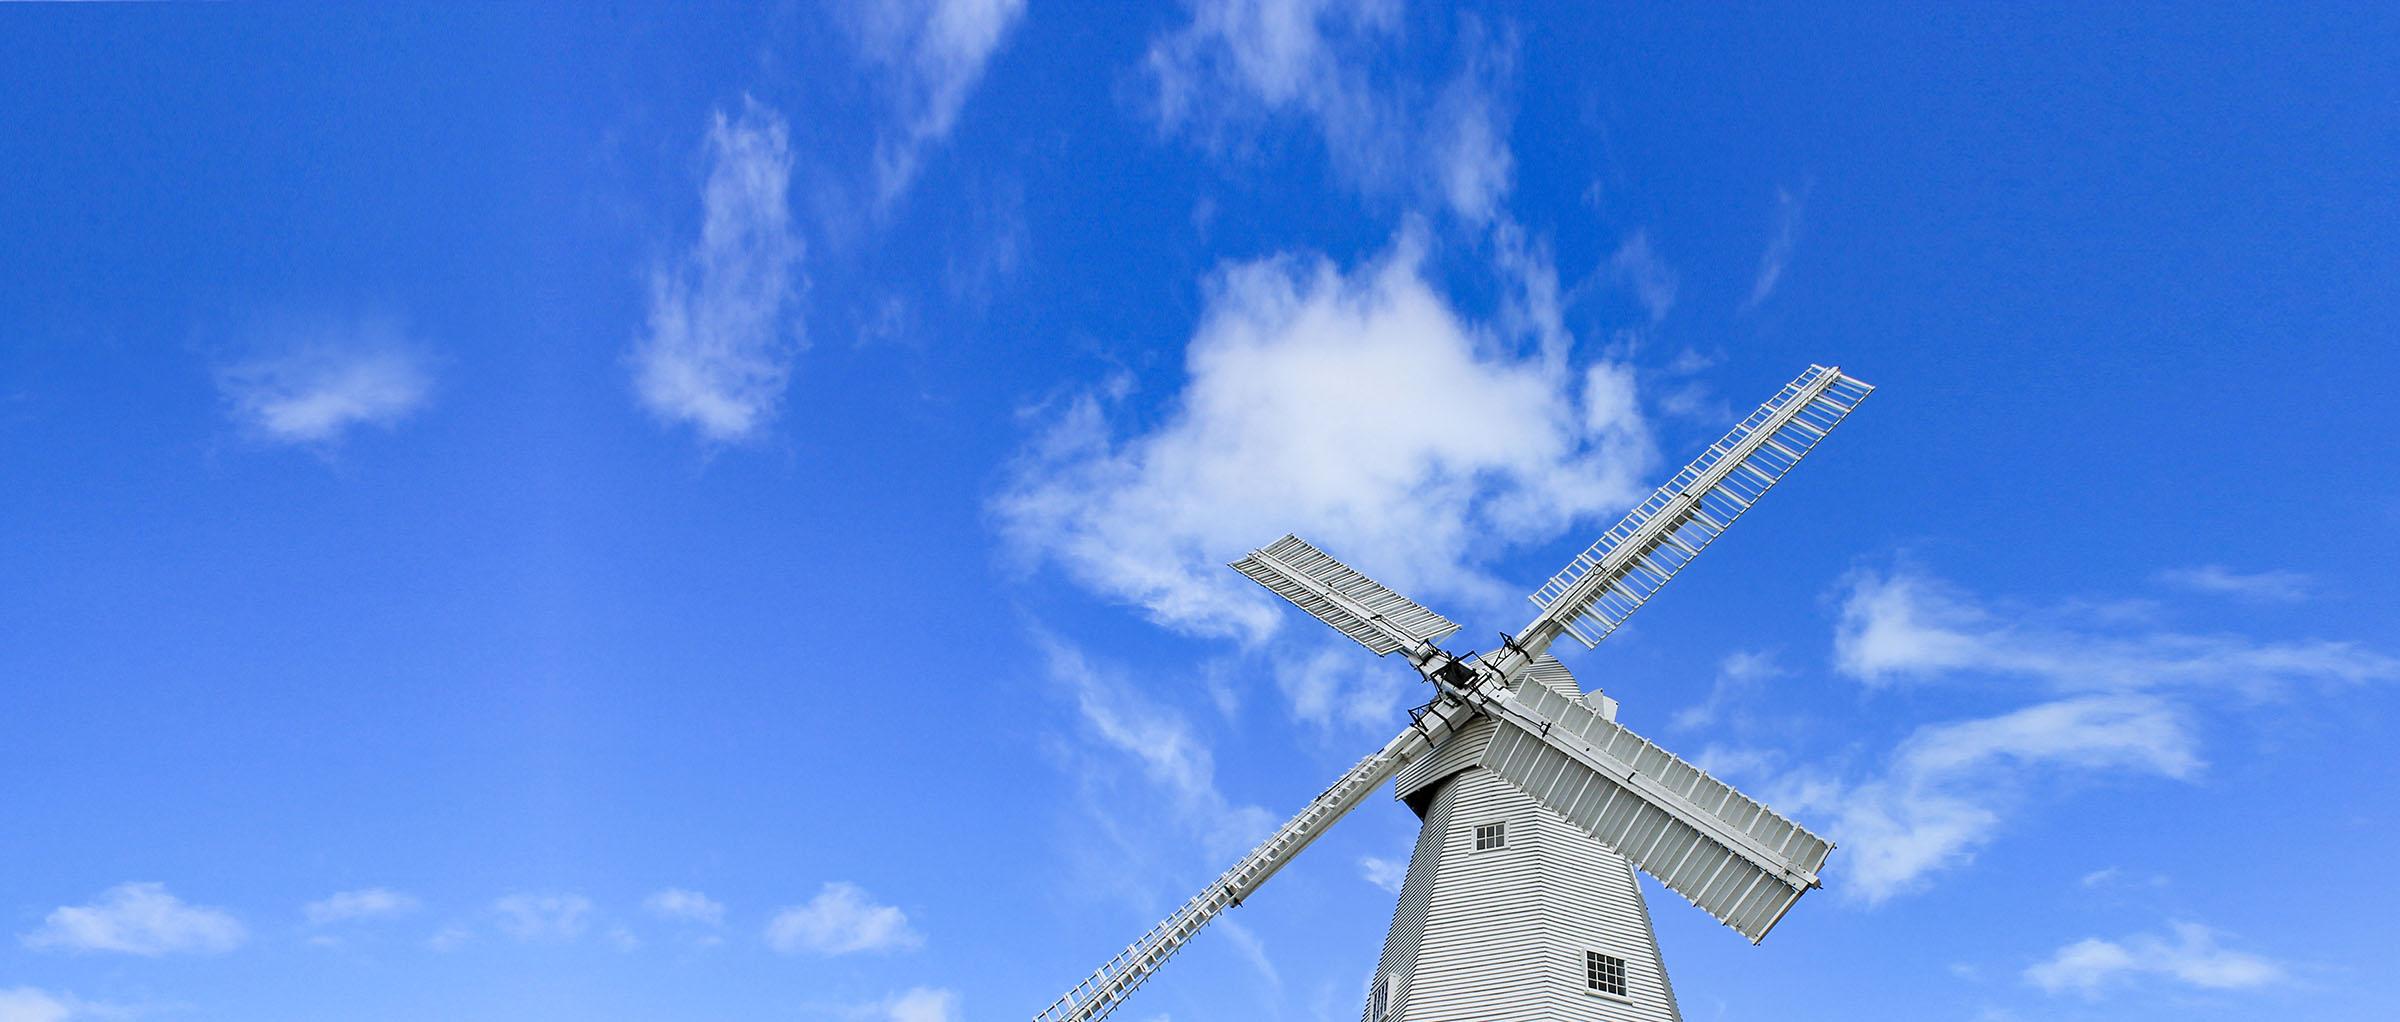 Union Mill at Cranbrook